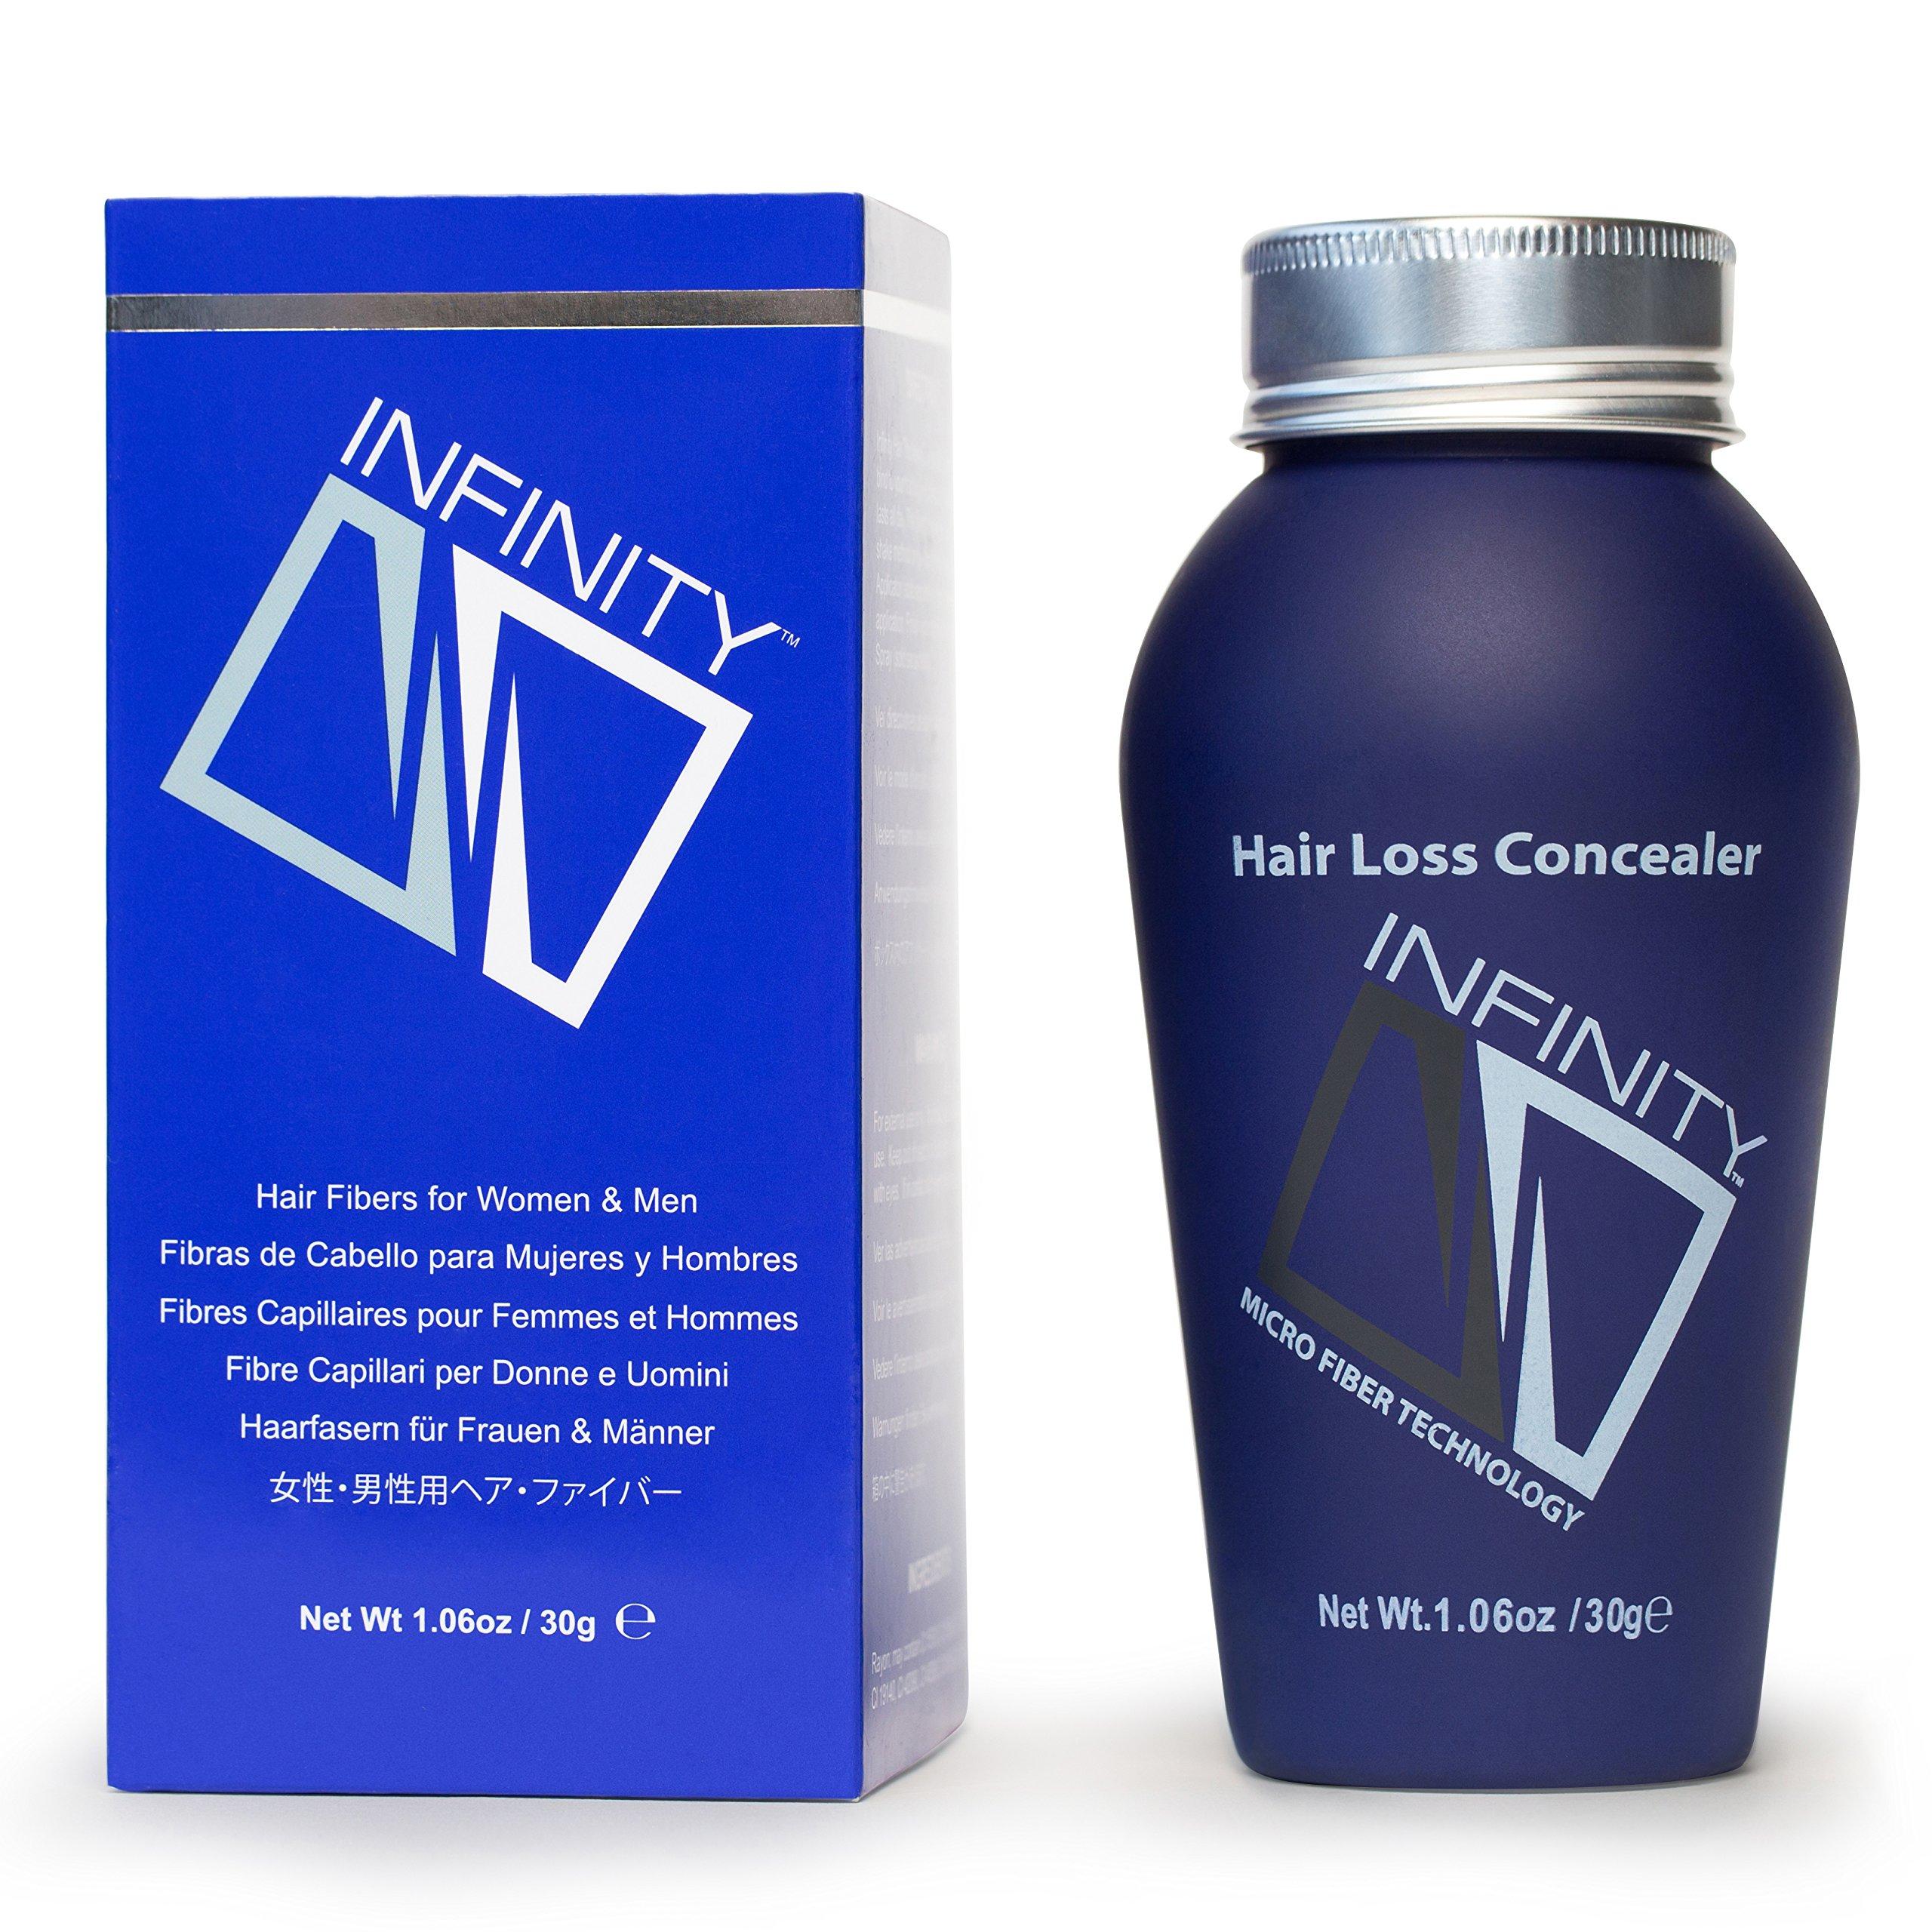 Infinity Hair Fiber - Hair Loss Concealer - Hair Thickening Fiber for Men & Women - Medium Brown, 28g by Infinity